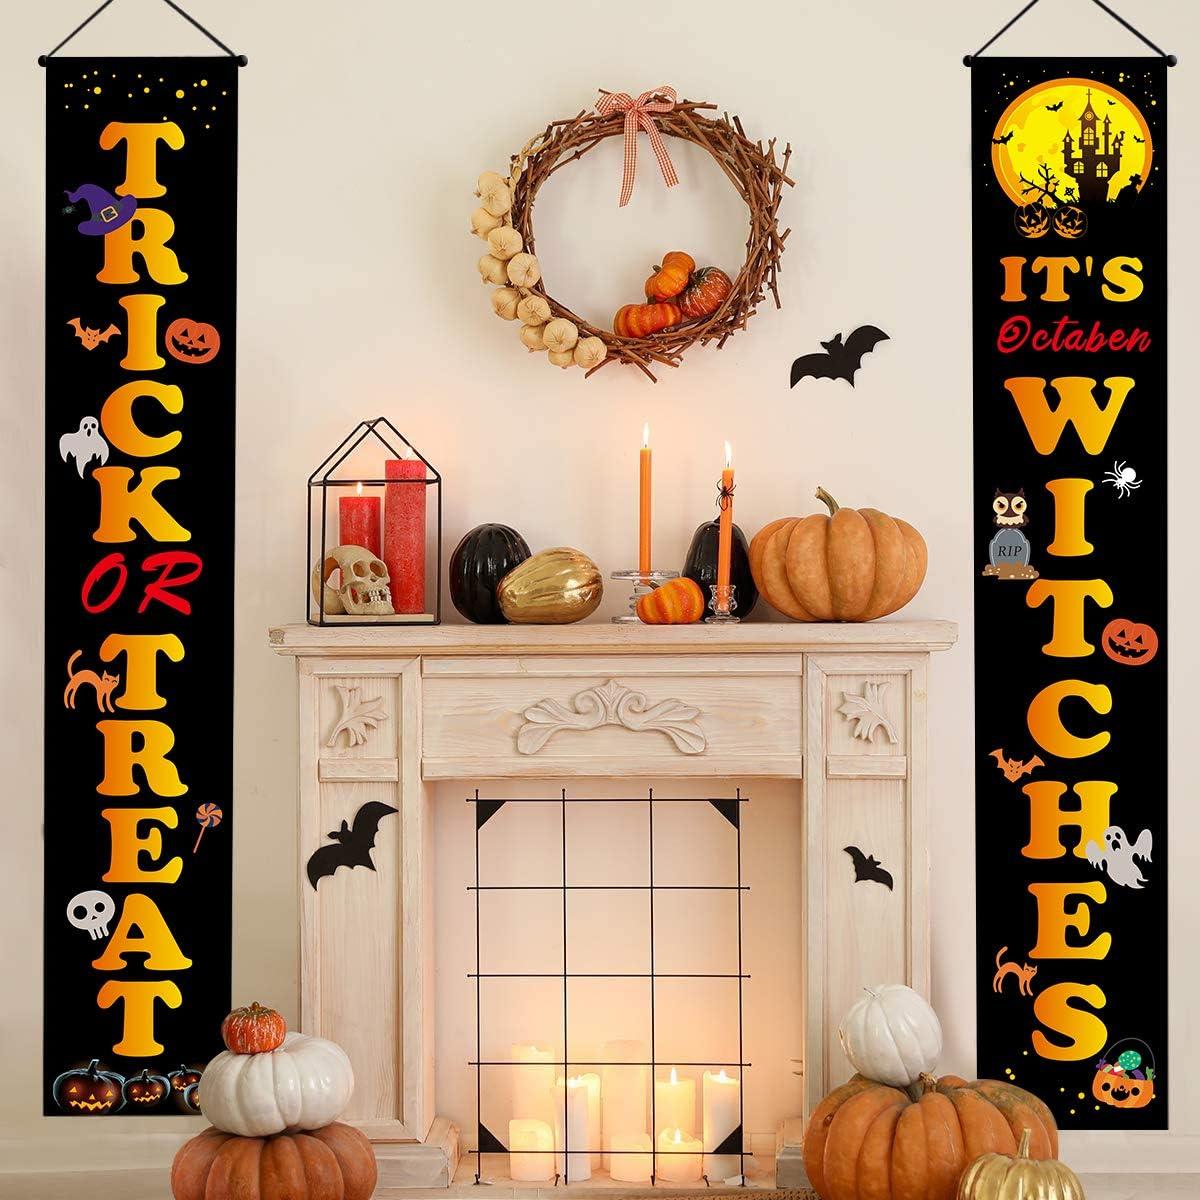 Abozoy Halloween Door Decorations Outdoor,Trick or Treat Halloween Banner Signs,Porch Decorations Welcome Signs for Front Door and Indoor Home Decor Supplies